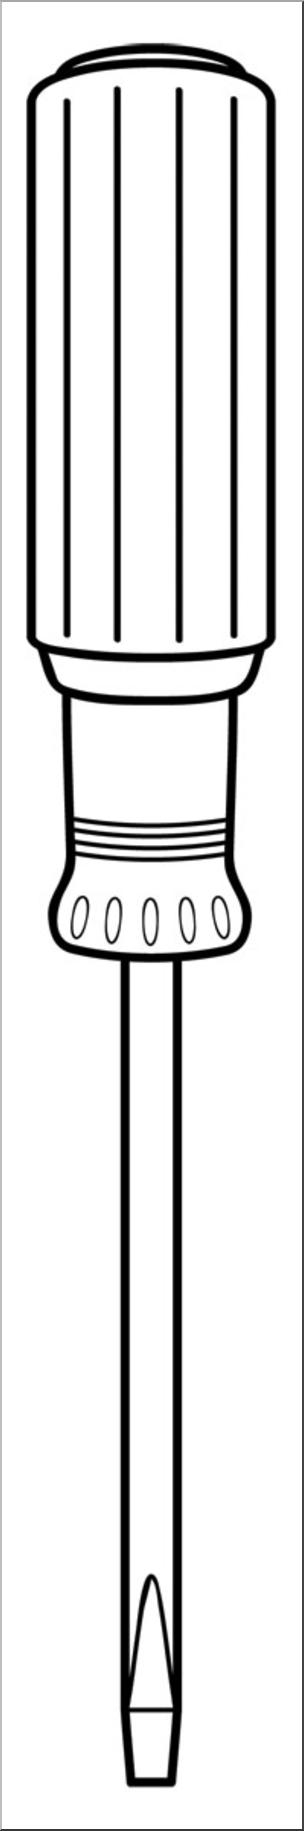 304x1831 Clip Art Tools Screwdriver Bampw I Abcteach